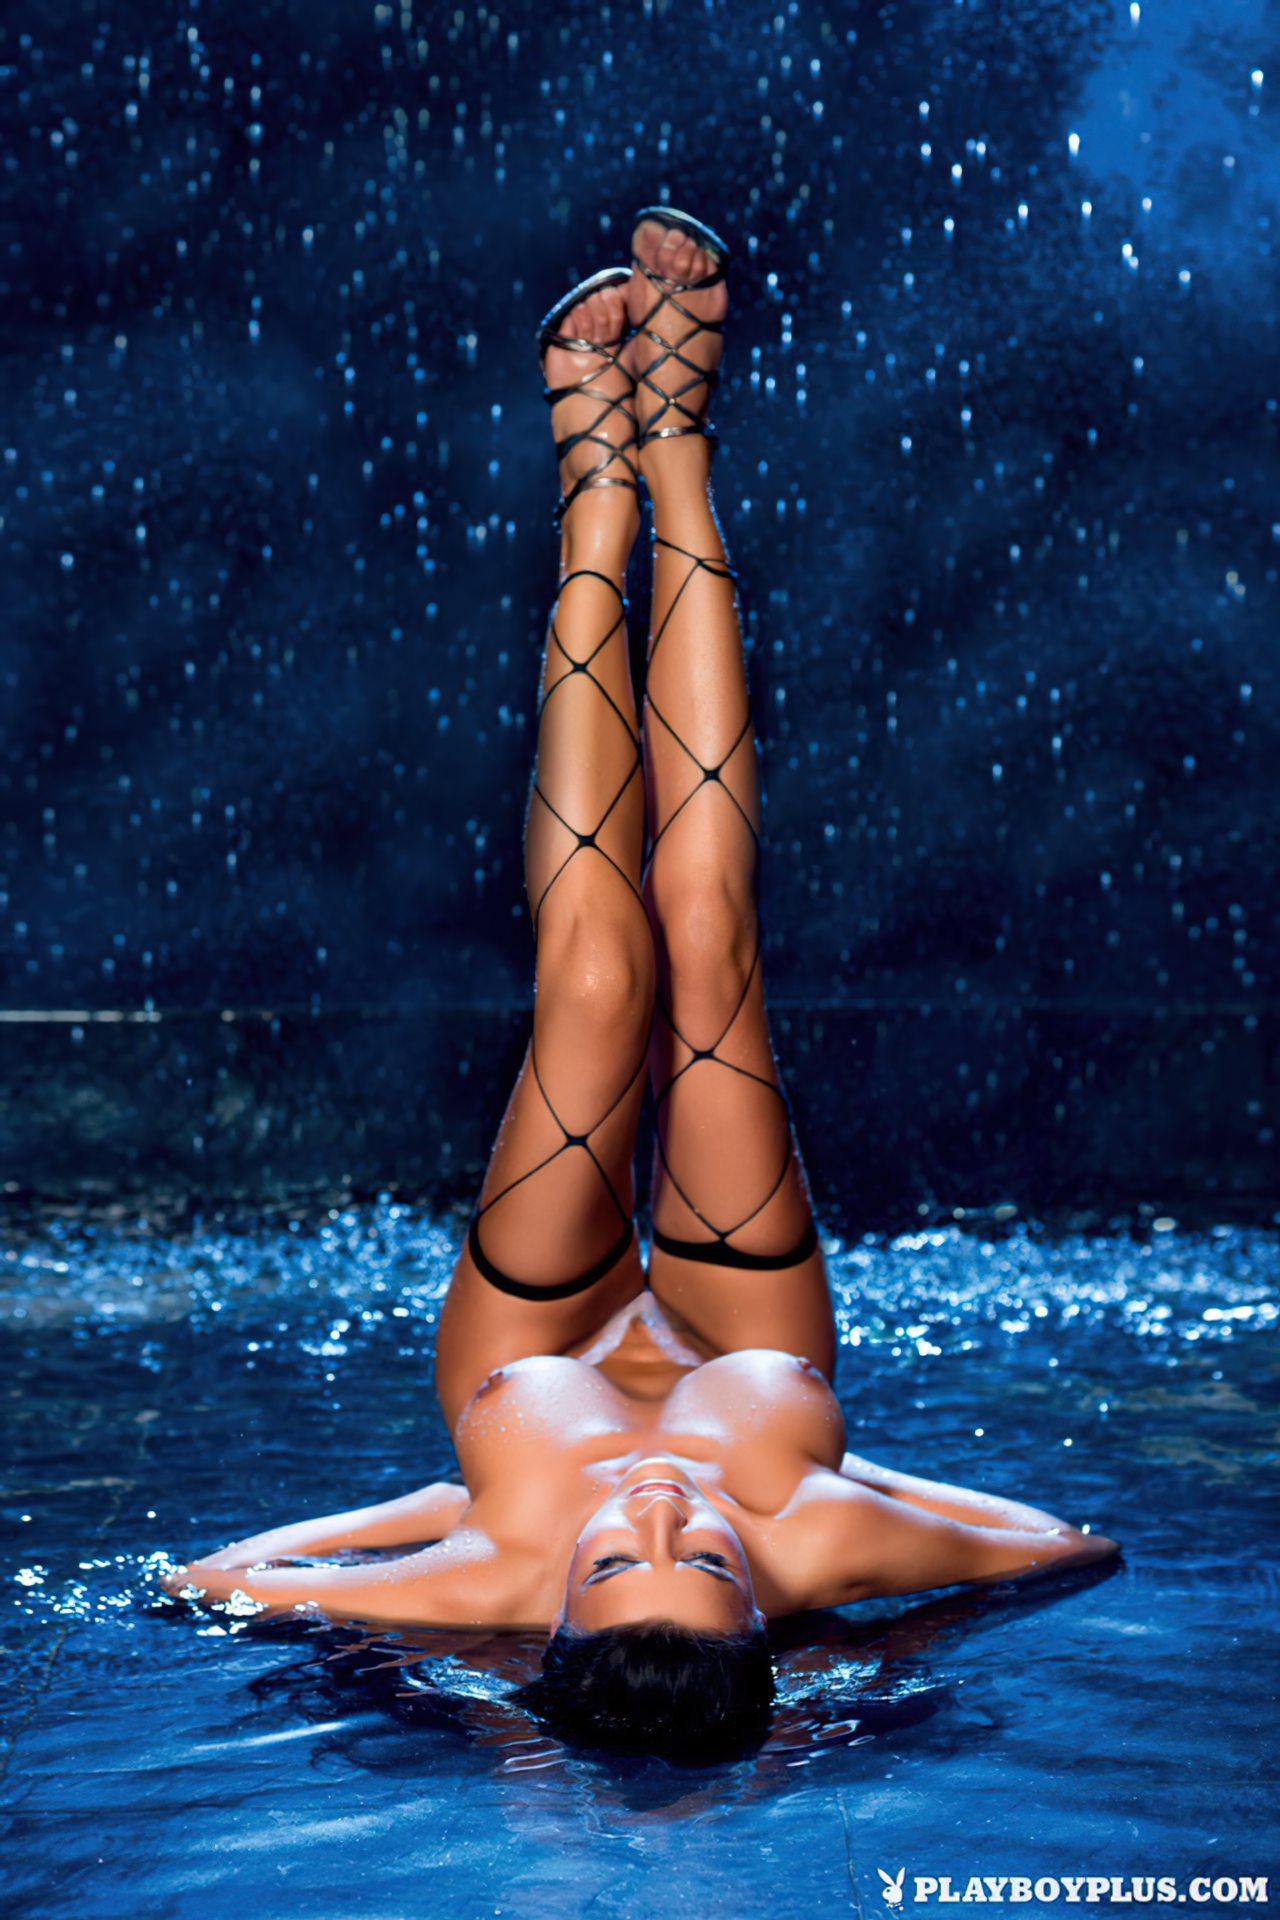 Oxana Bondarenko Playboy (2)